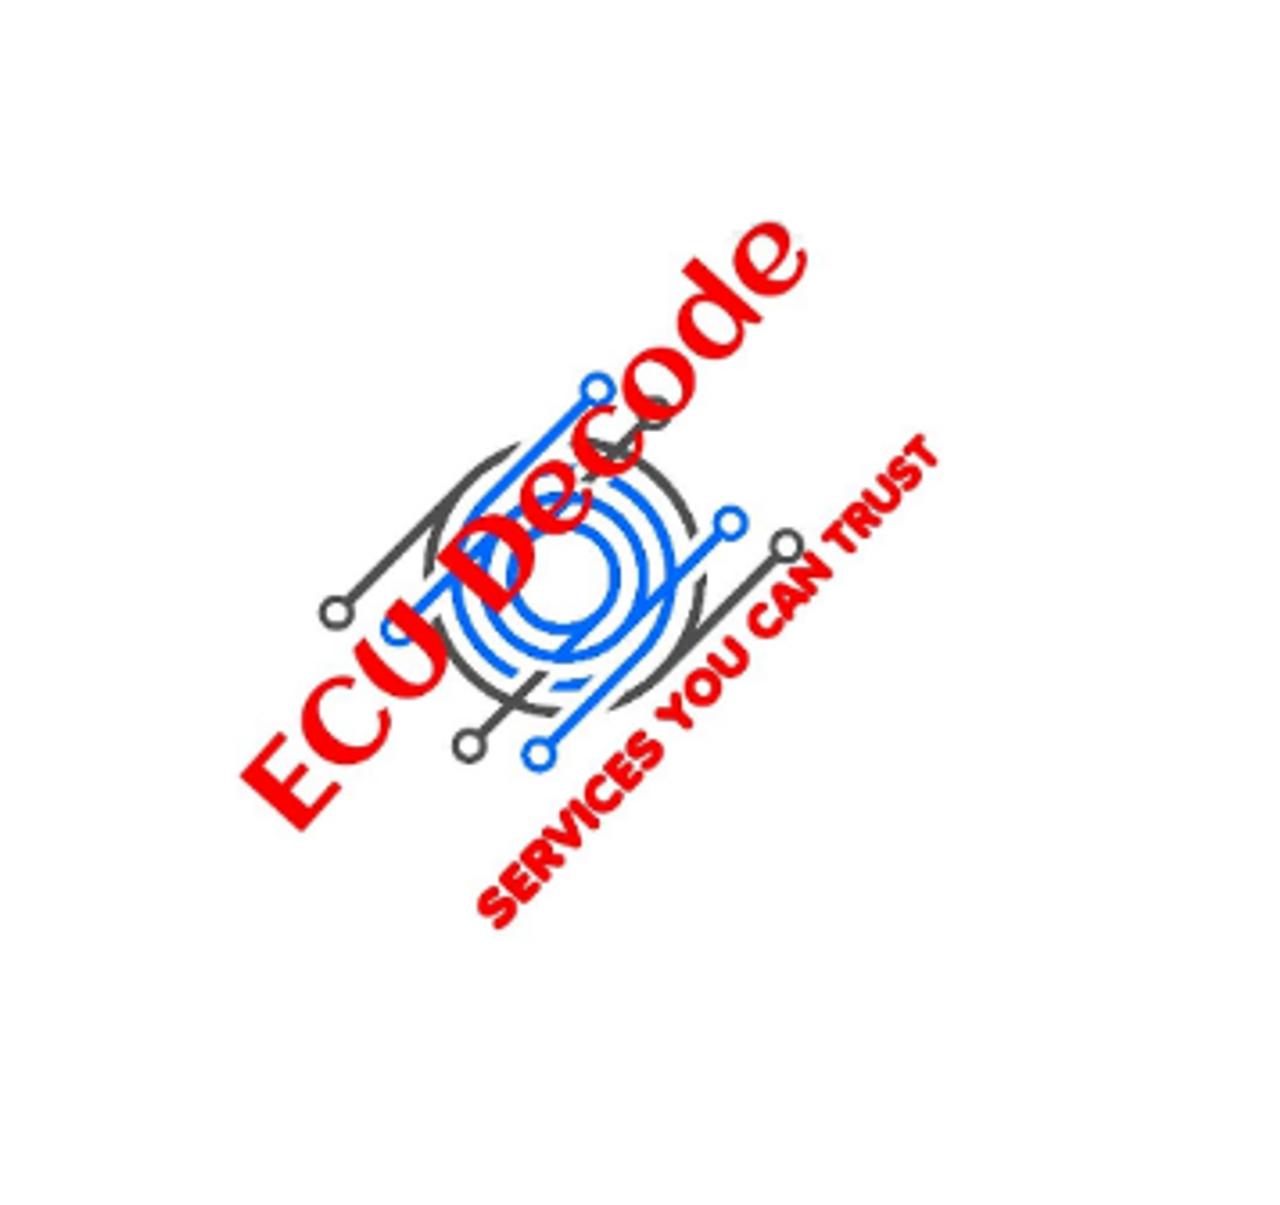 Honda Civic | 37820-PRA-E13 | 362824-4X06 SE | Type R | Cloning | Immobiliser Bypass | Plug & Play Services